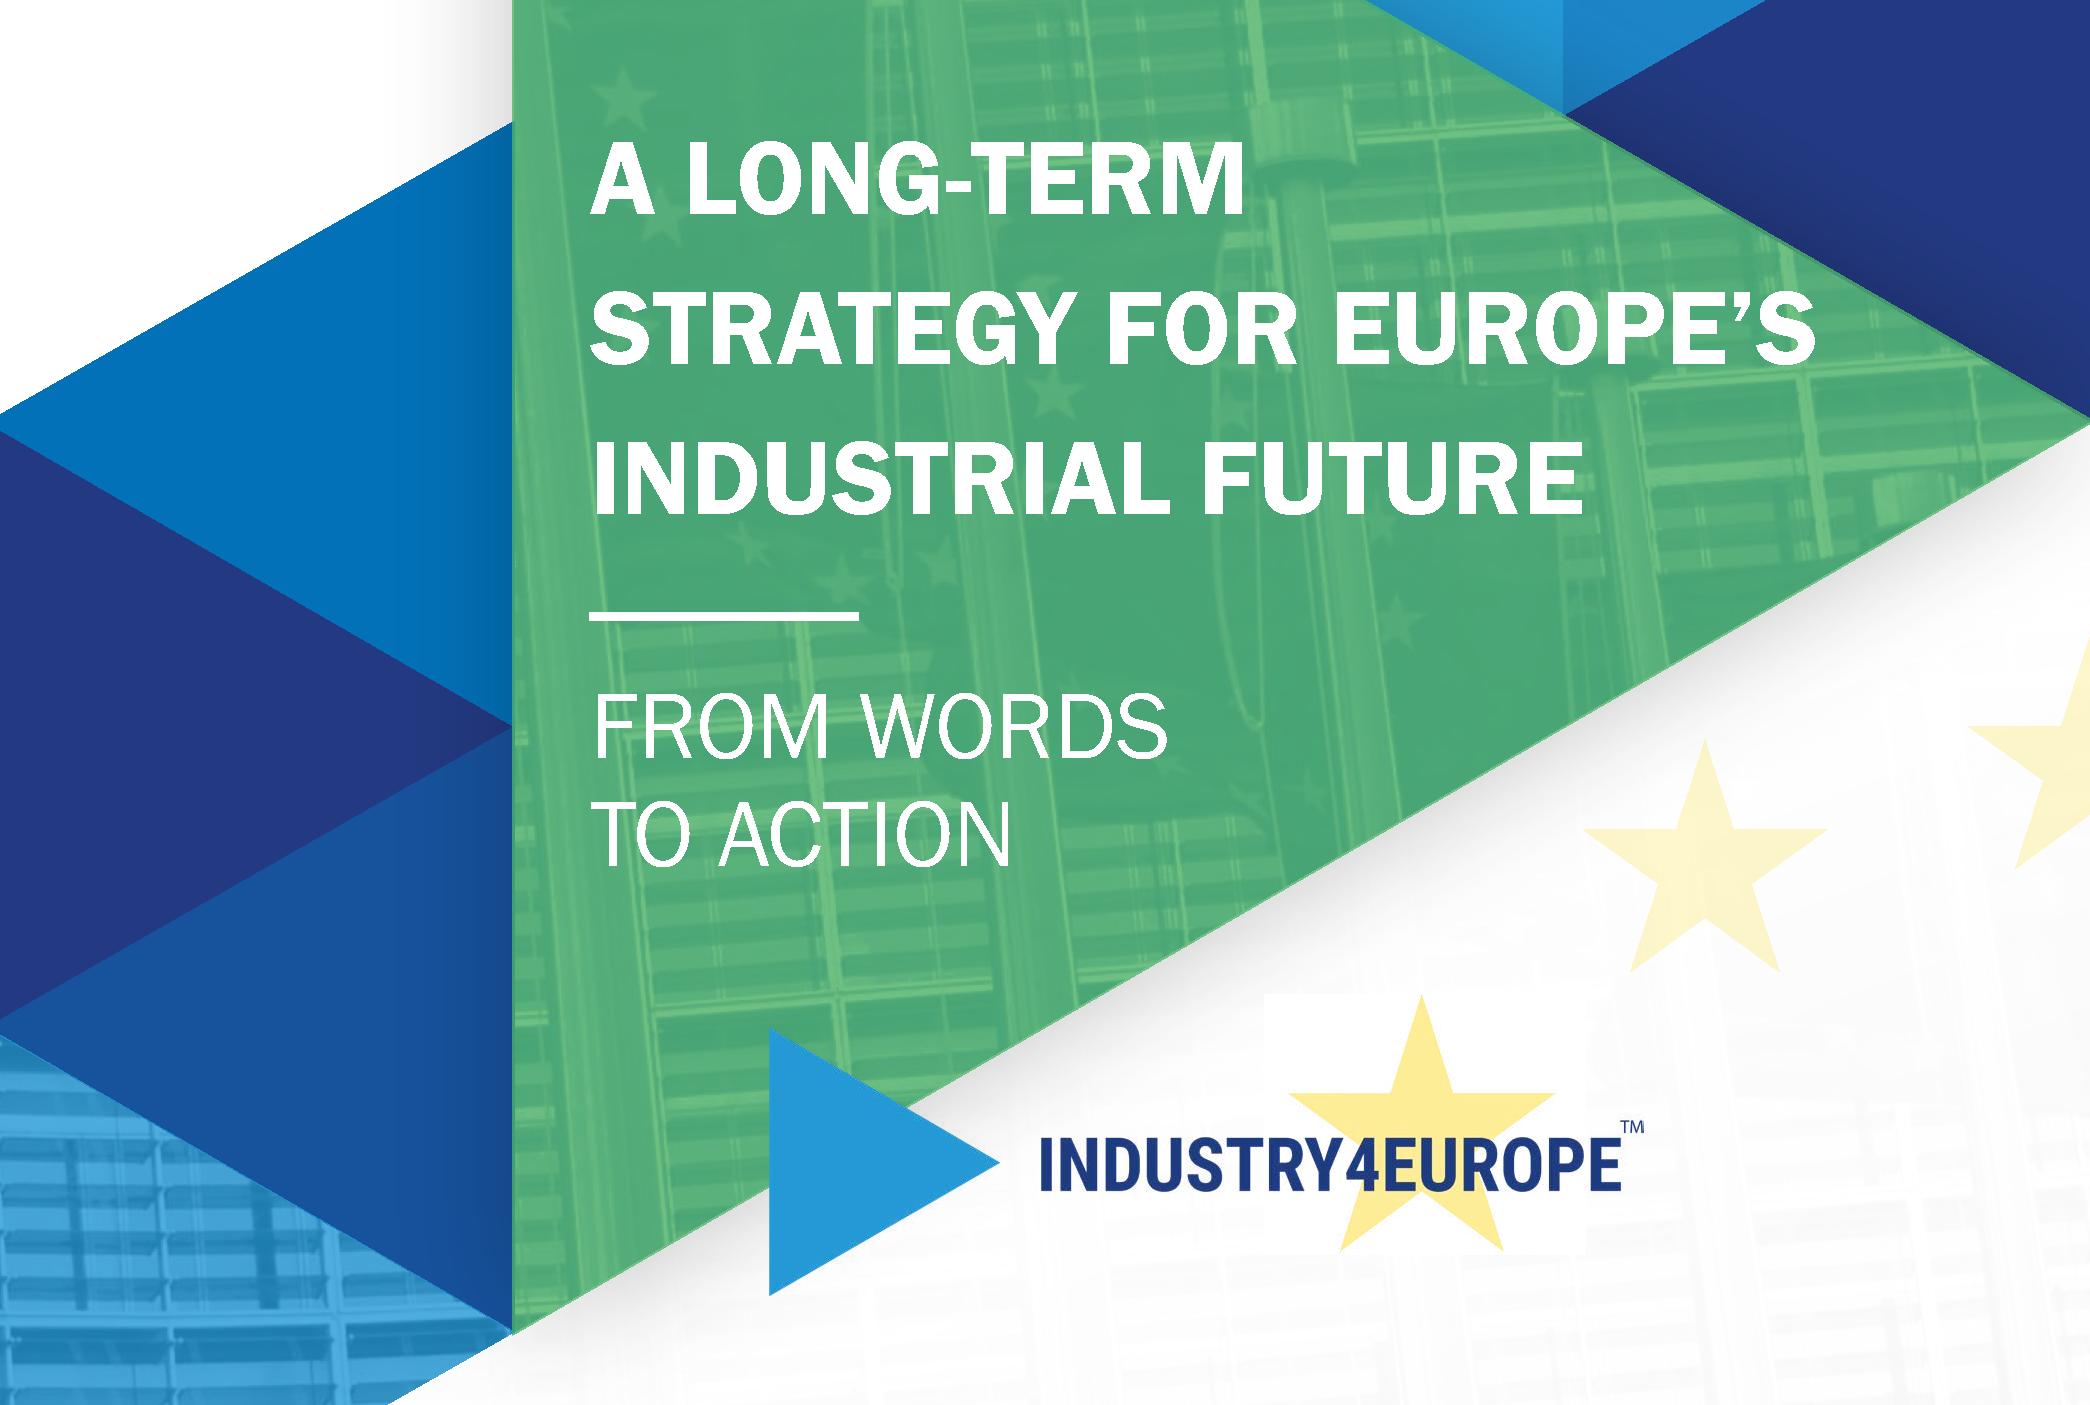 2019-11-26_-_Industry4Europe